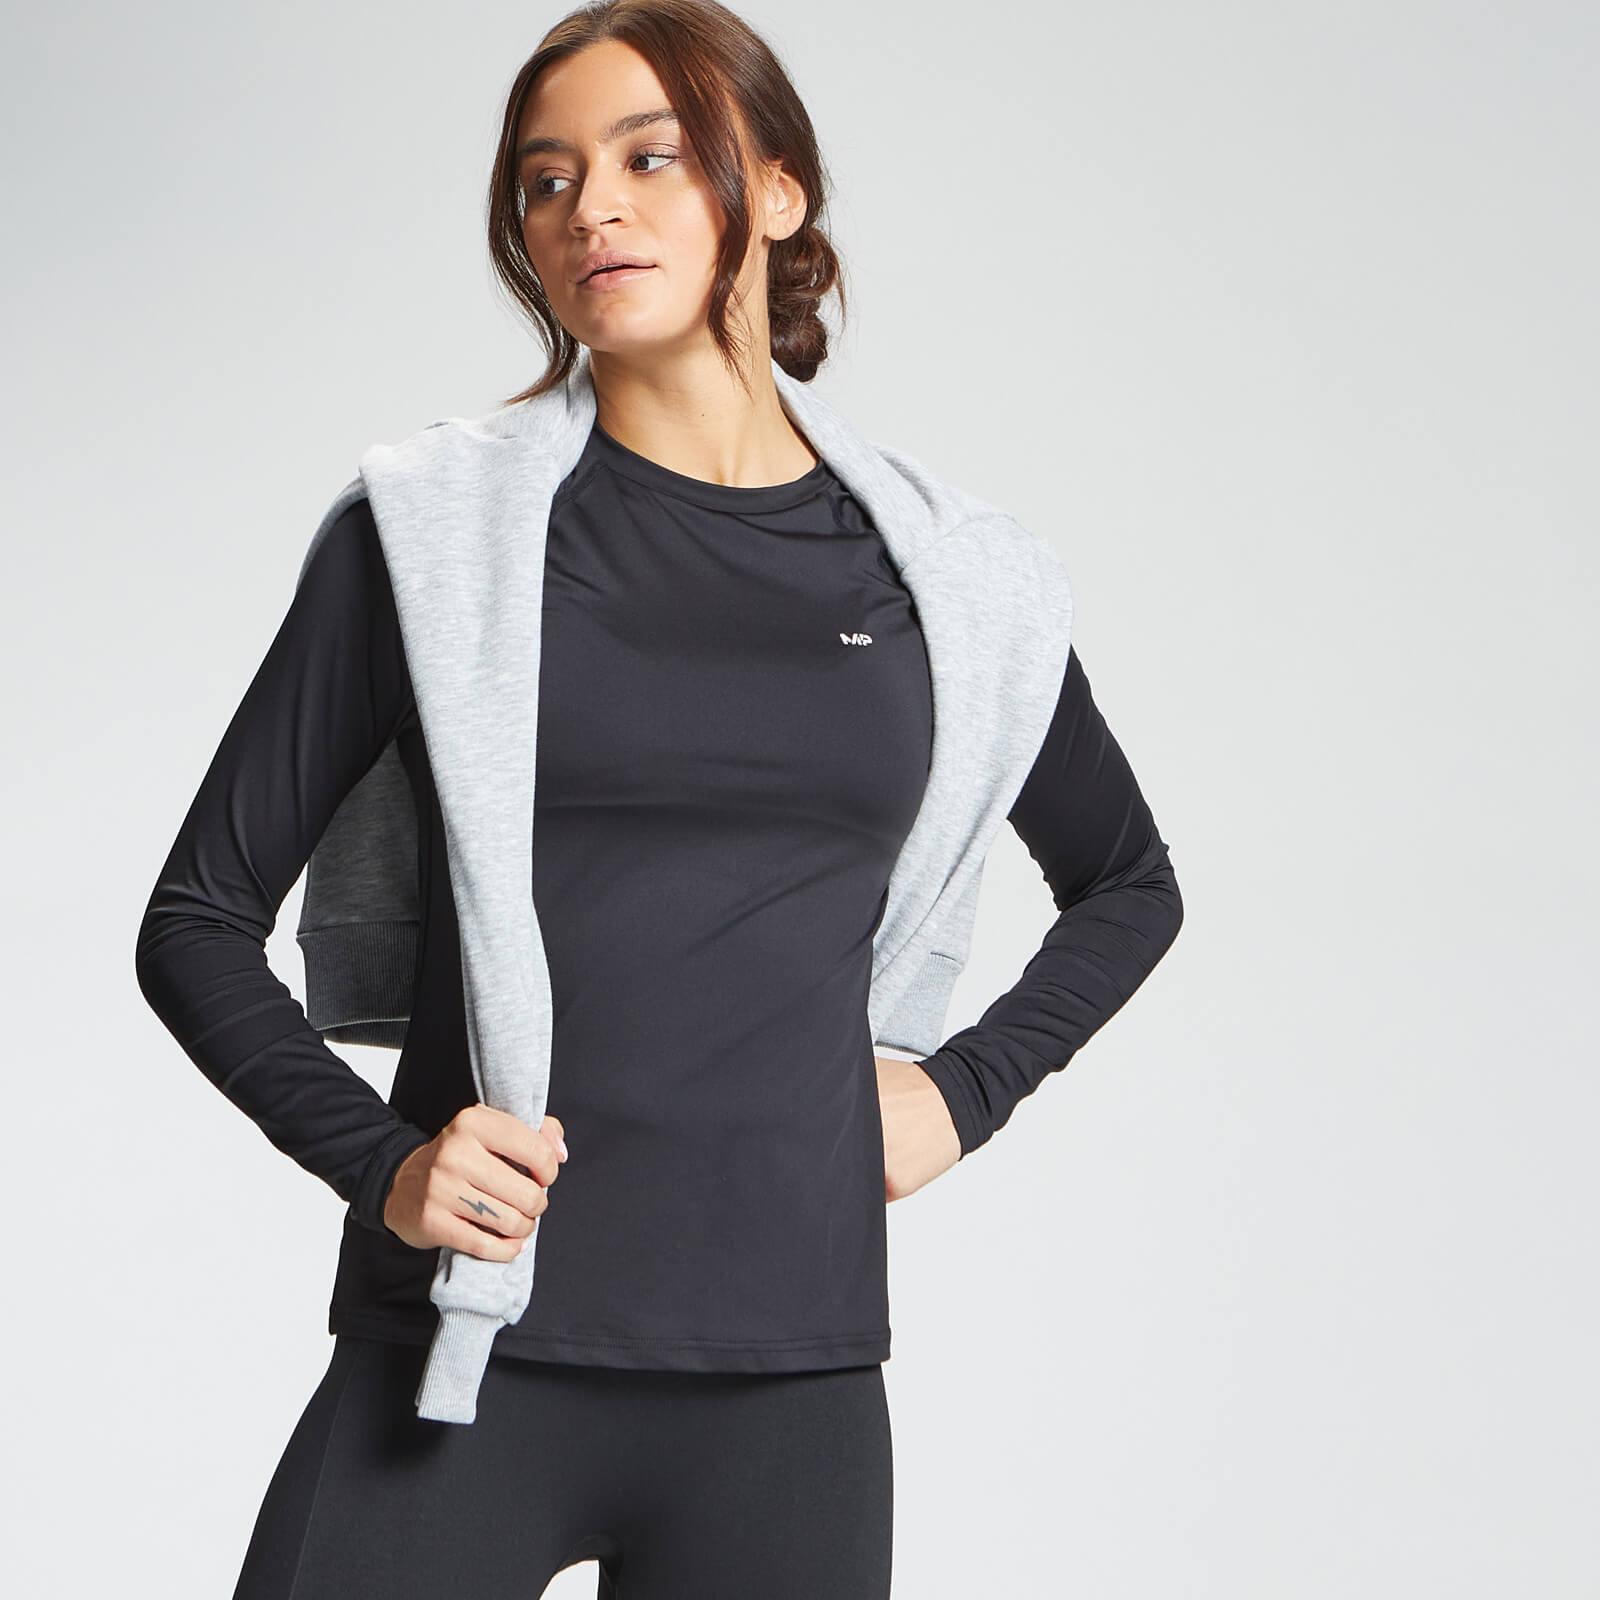 Купить MP Women's Essentials Training Slim Fit Long Sleeve Top - Black - XXS, Myprotein International